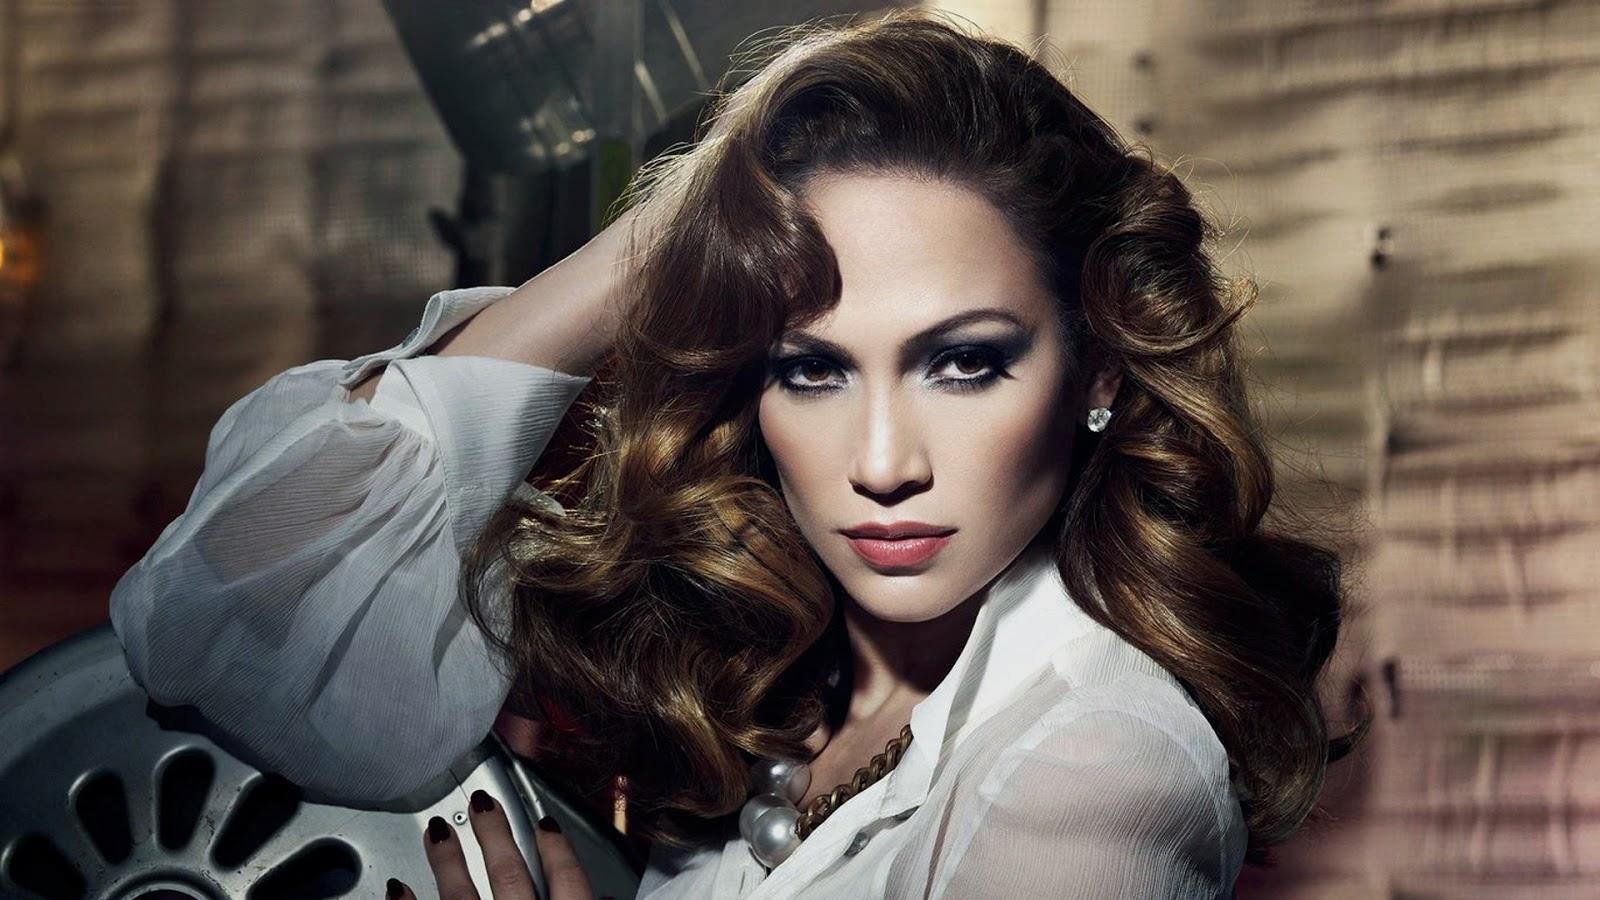 Jennifer Lopez Glamour Wallpaper very high quality desktop wallpapers 1600x900